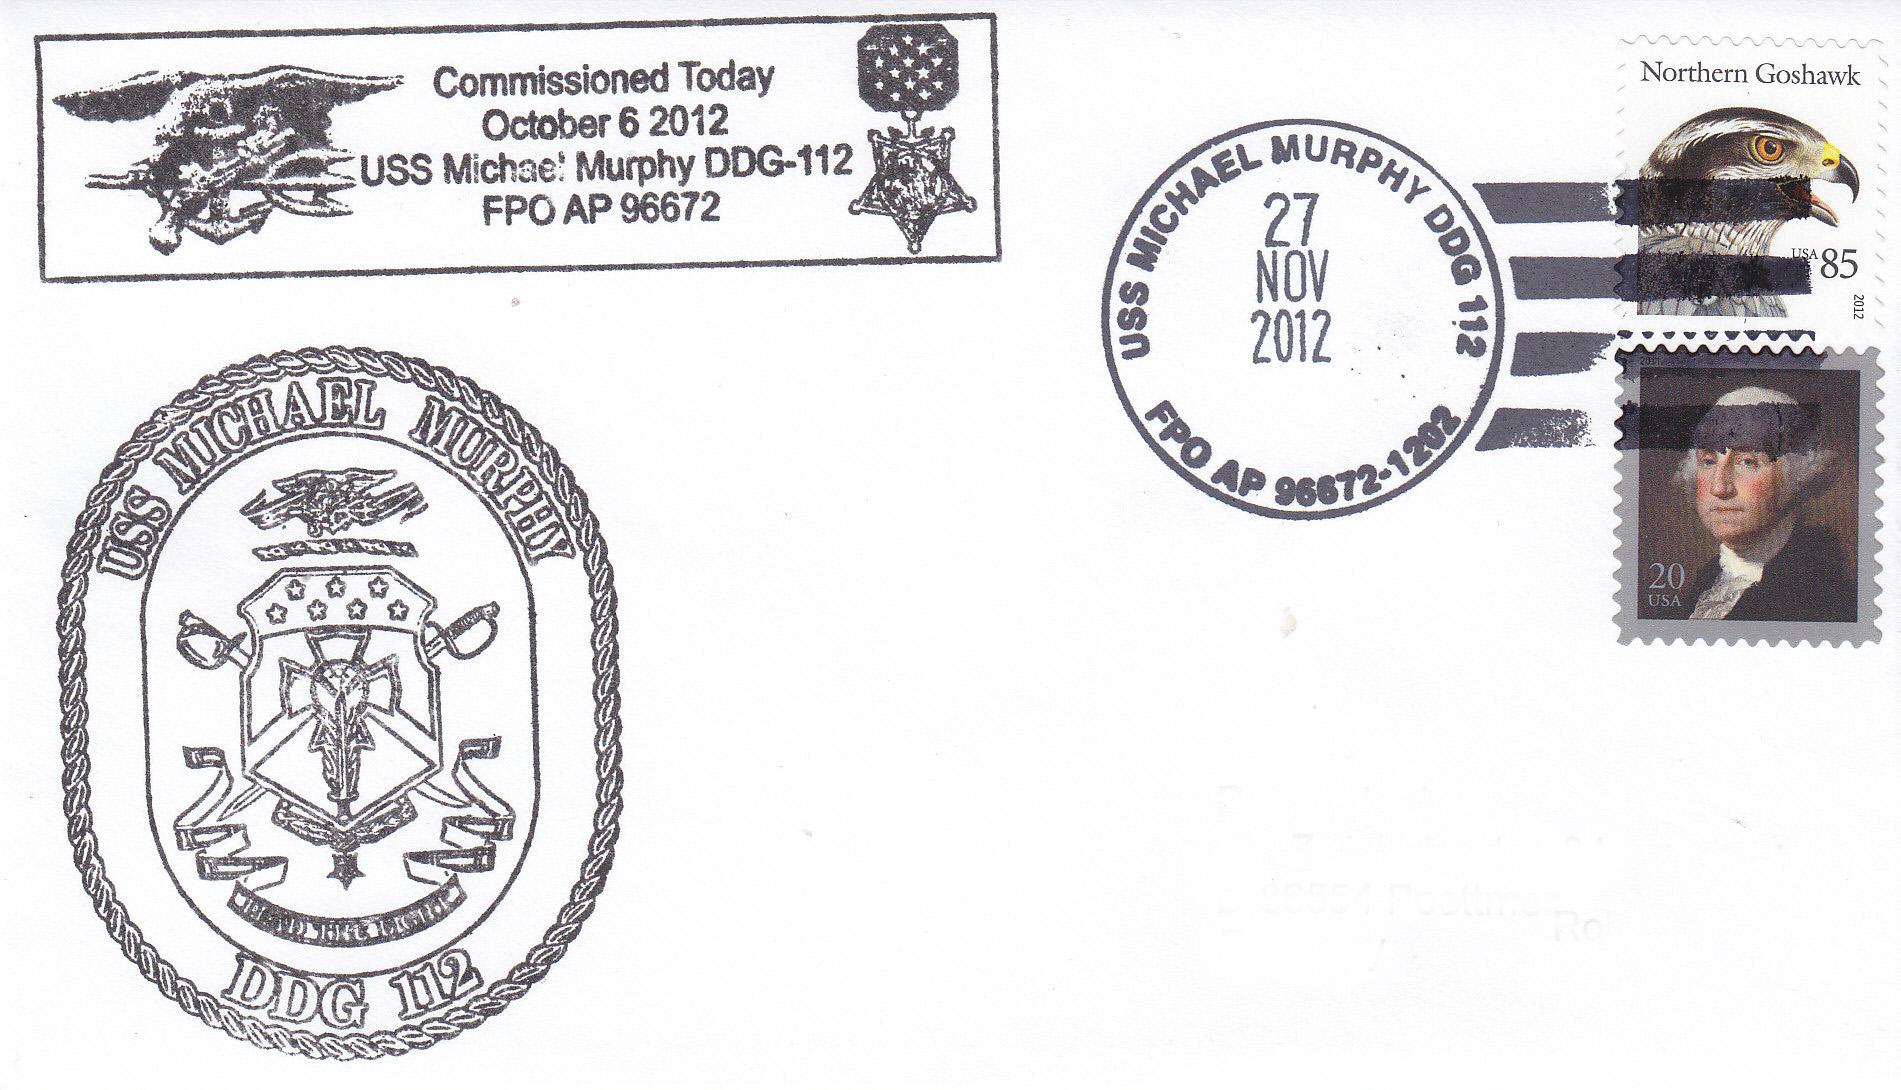 Beleg USS MICHAEL MURPHY DDG-112 Commissioning?